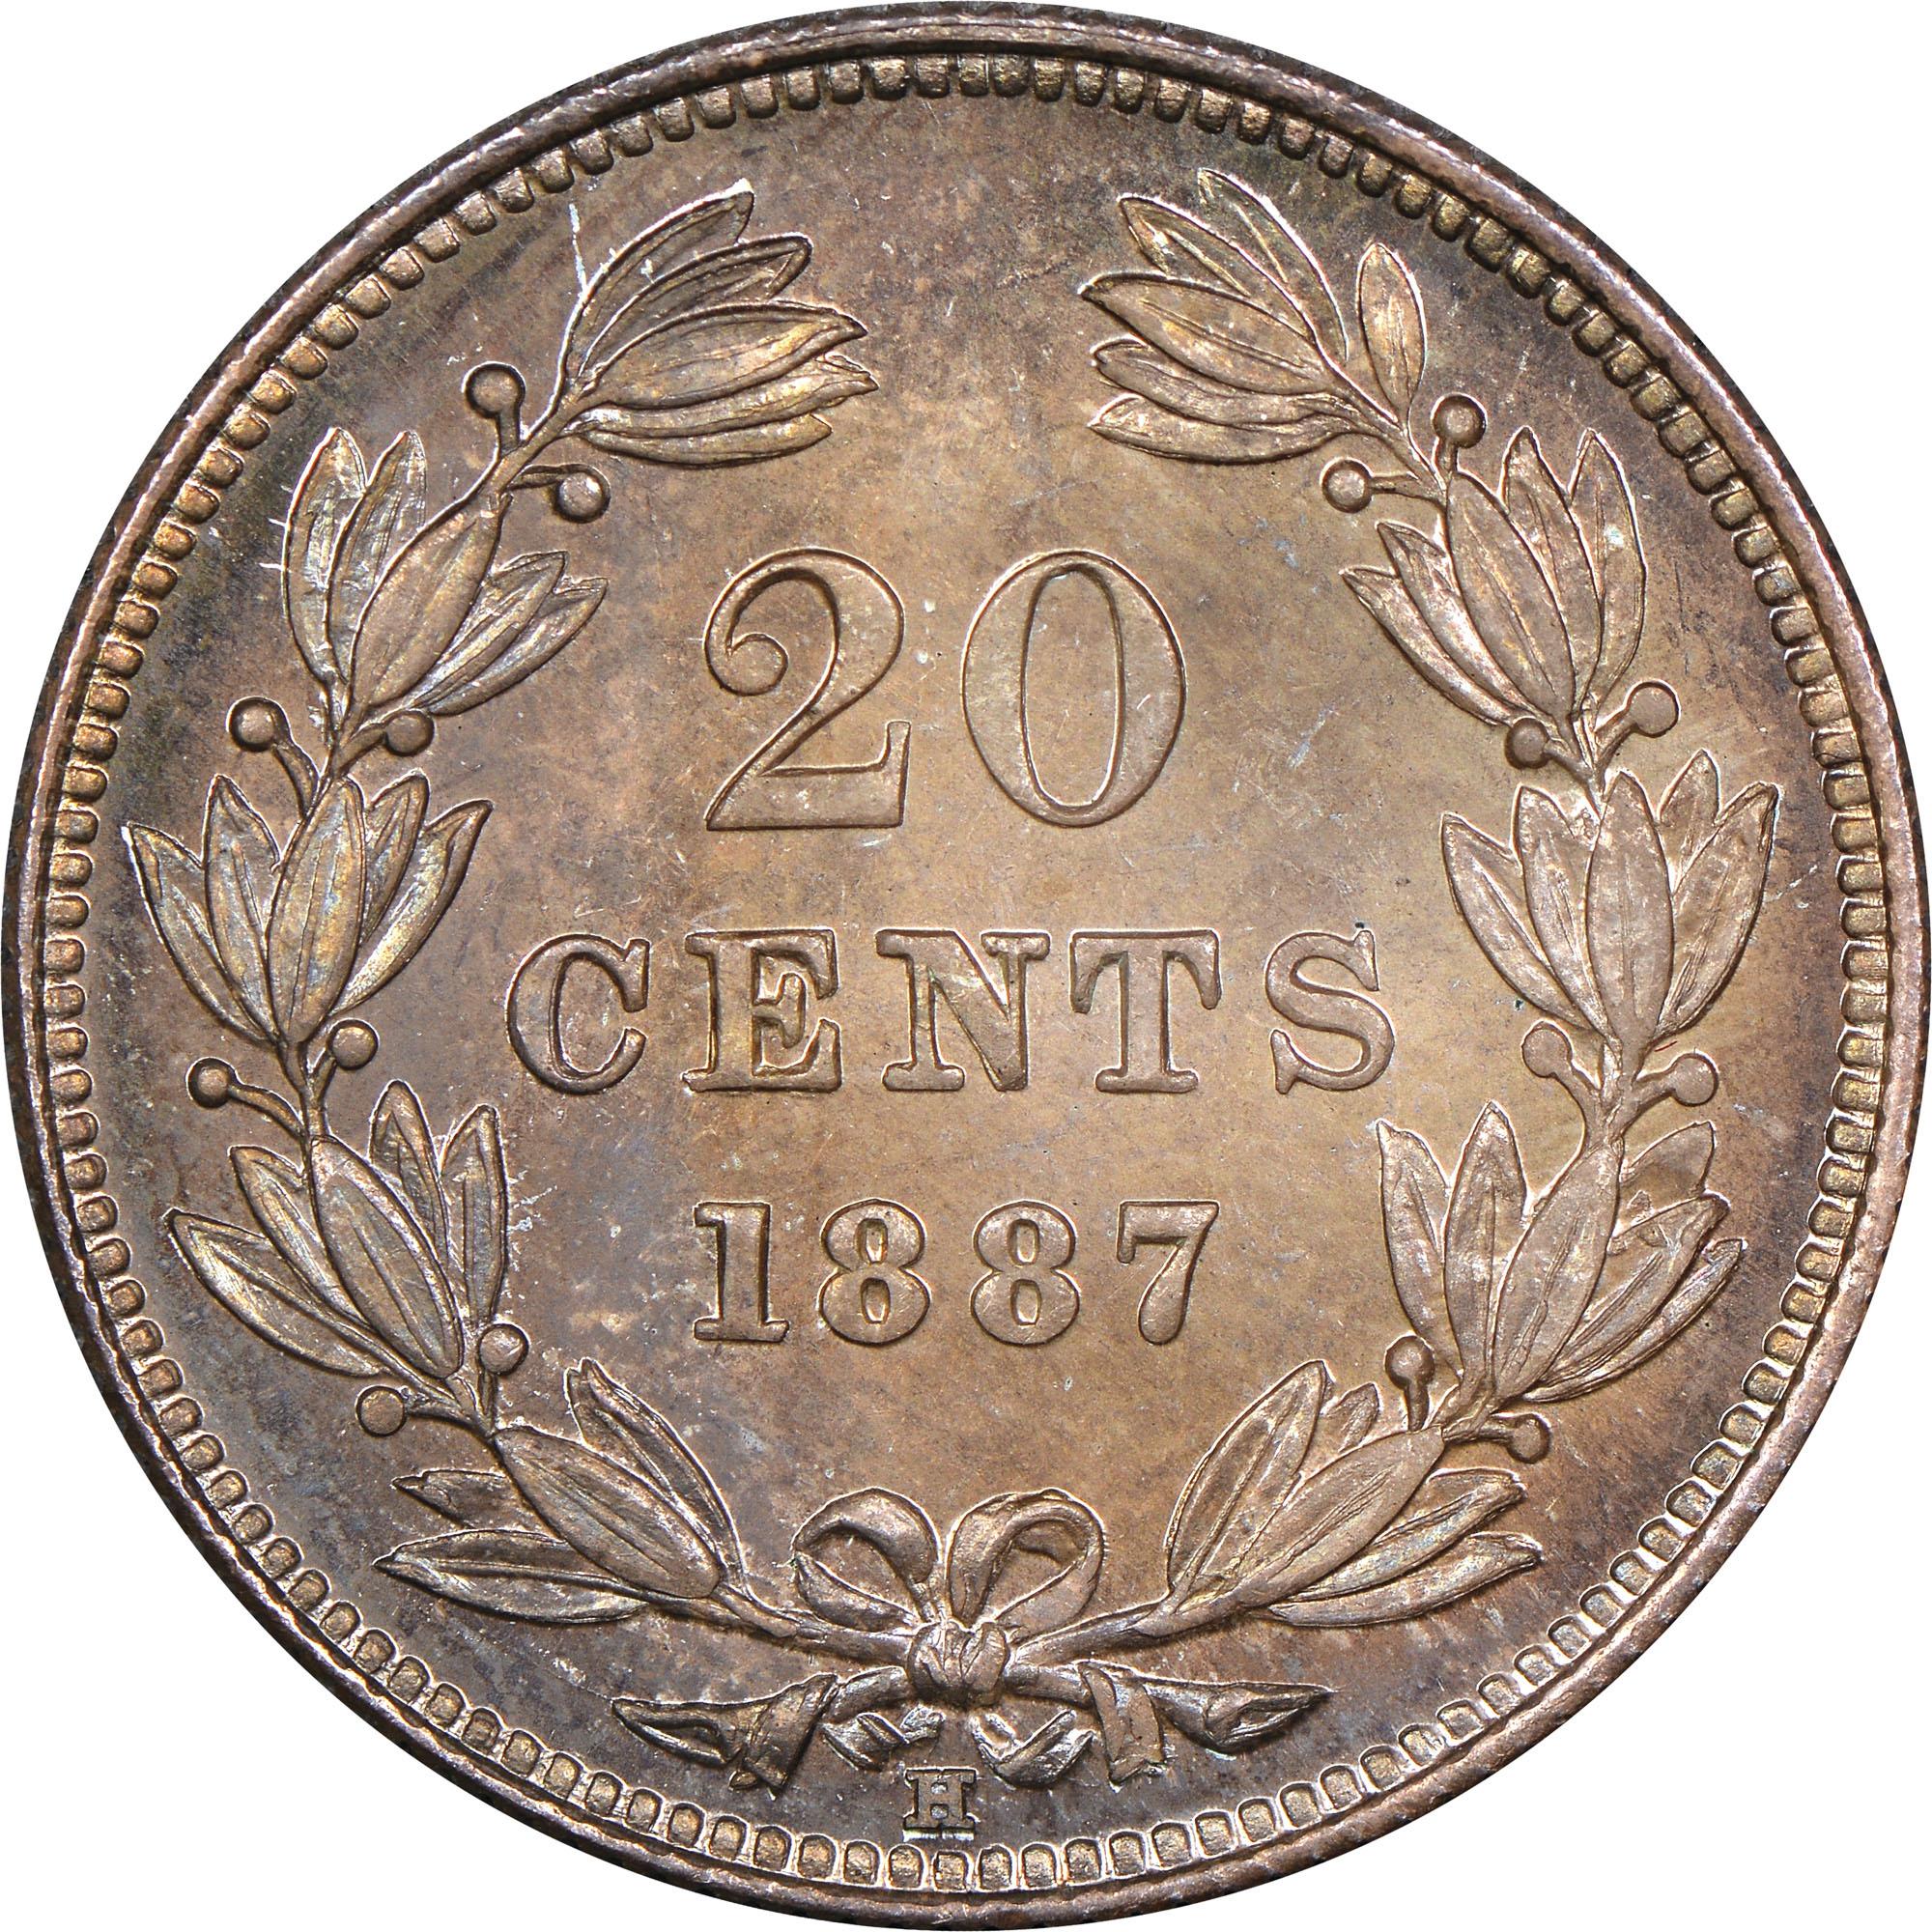 Nicaragua 20 Centavos reverse